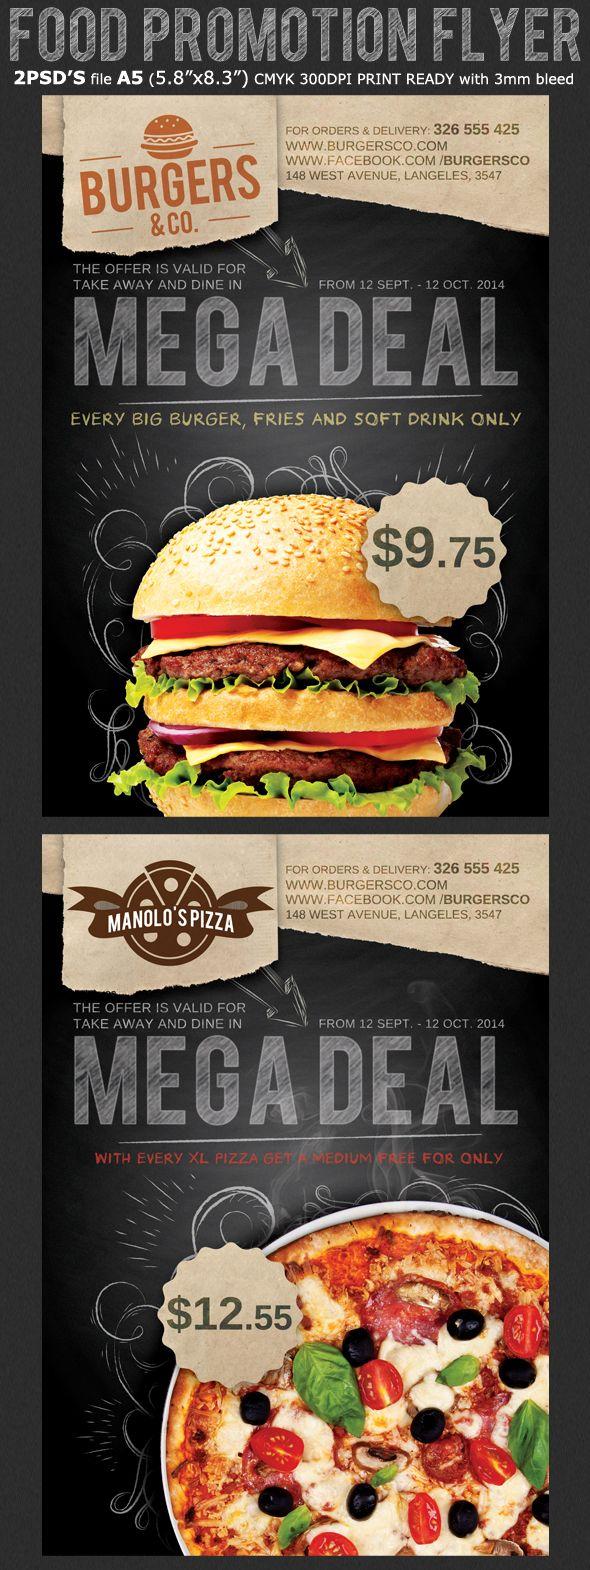 Restaurant/Fast Food Promotion Flyer Template on Behance